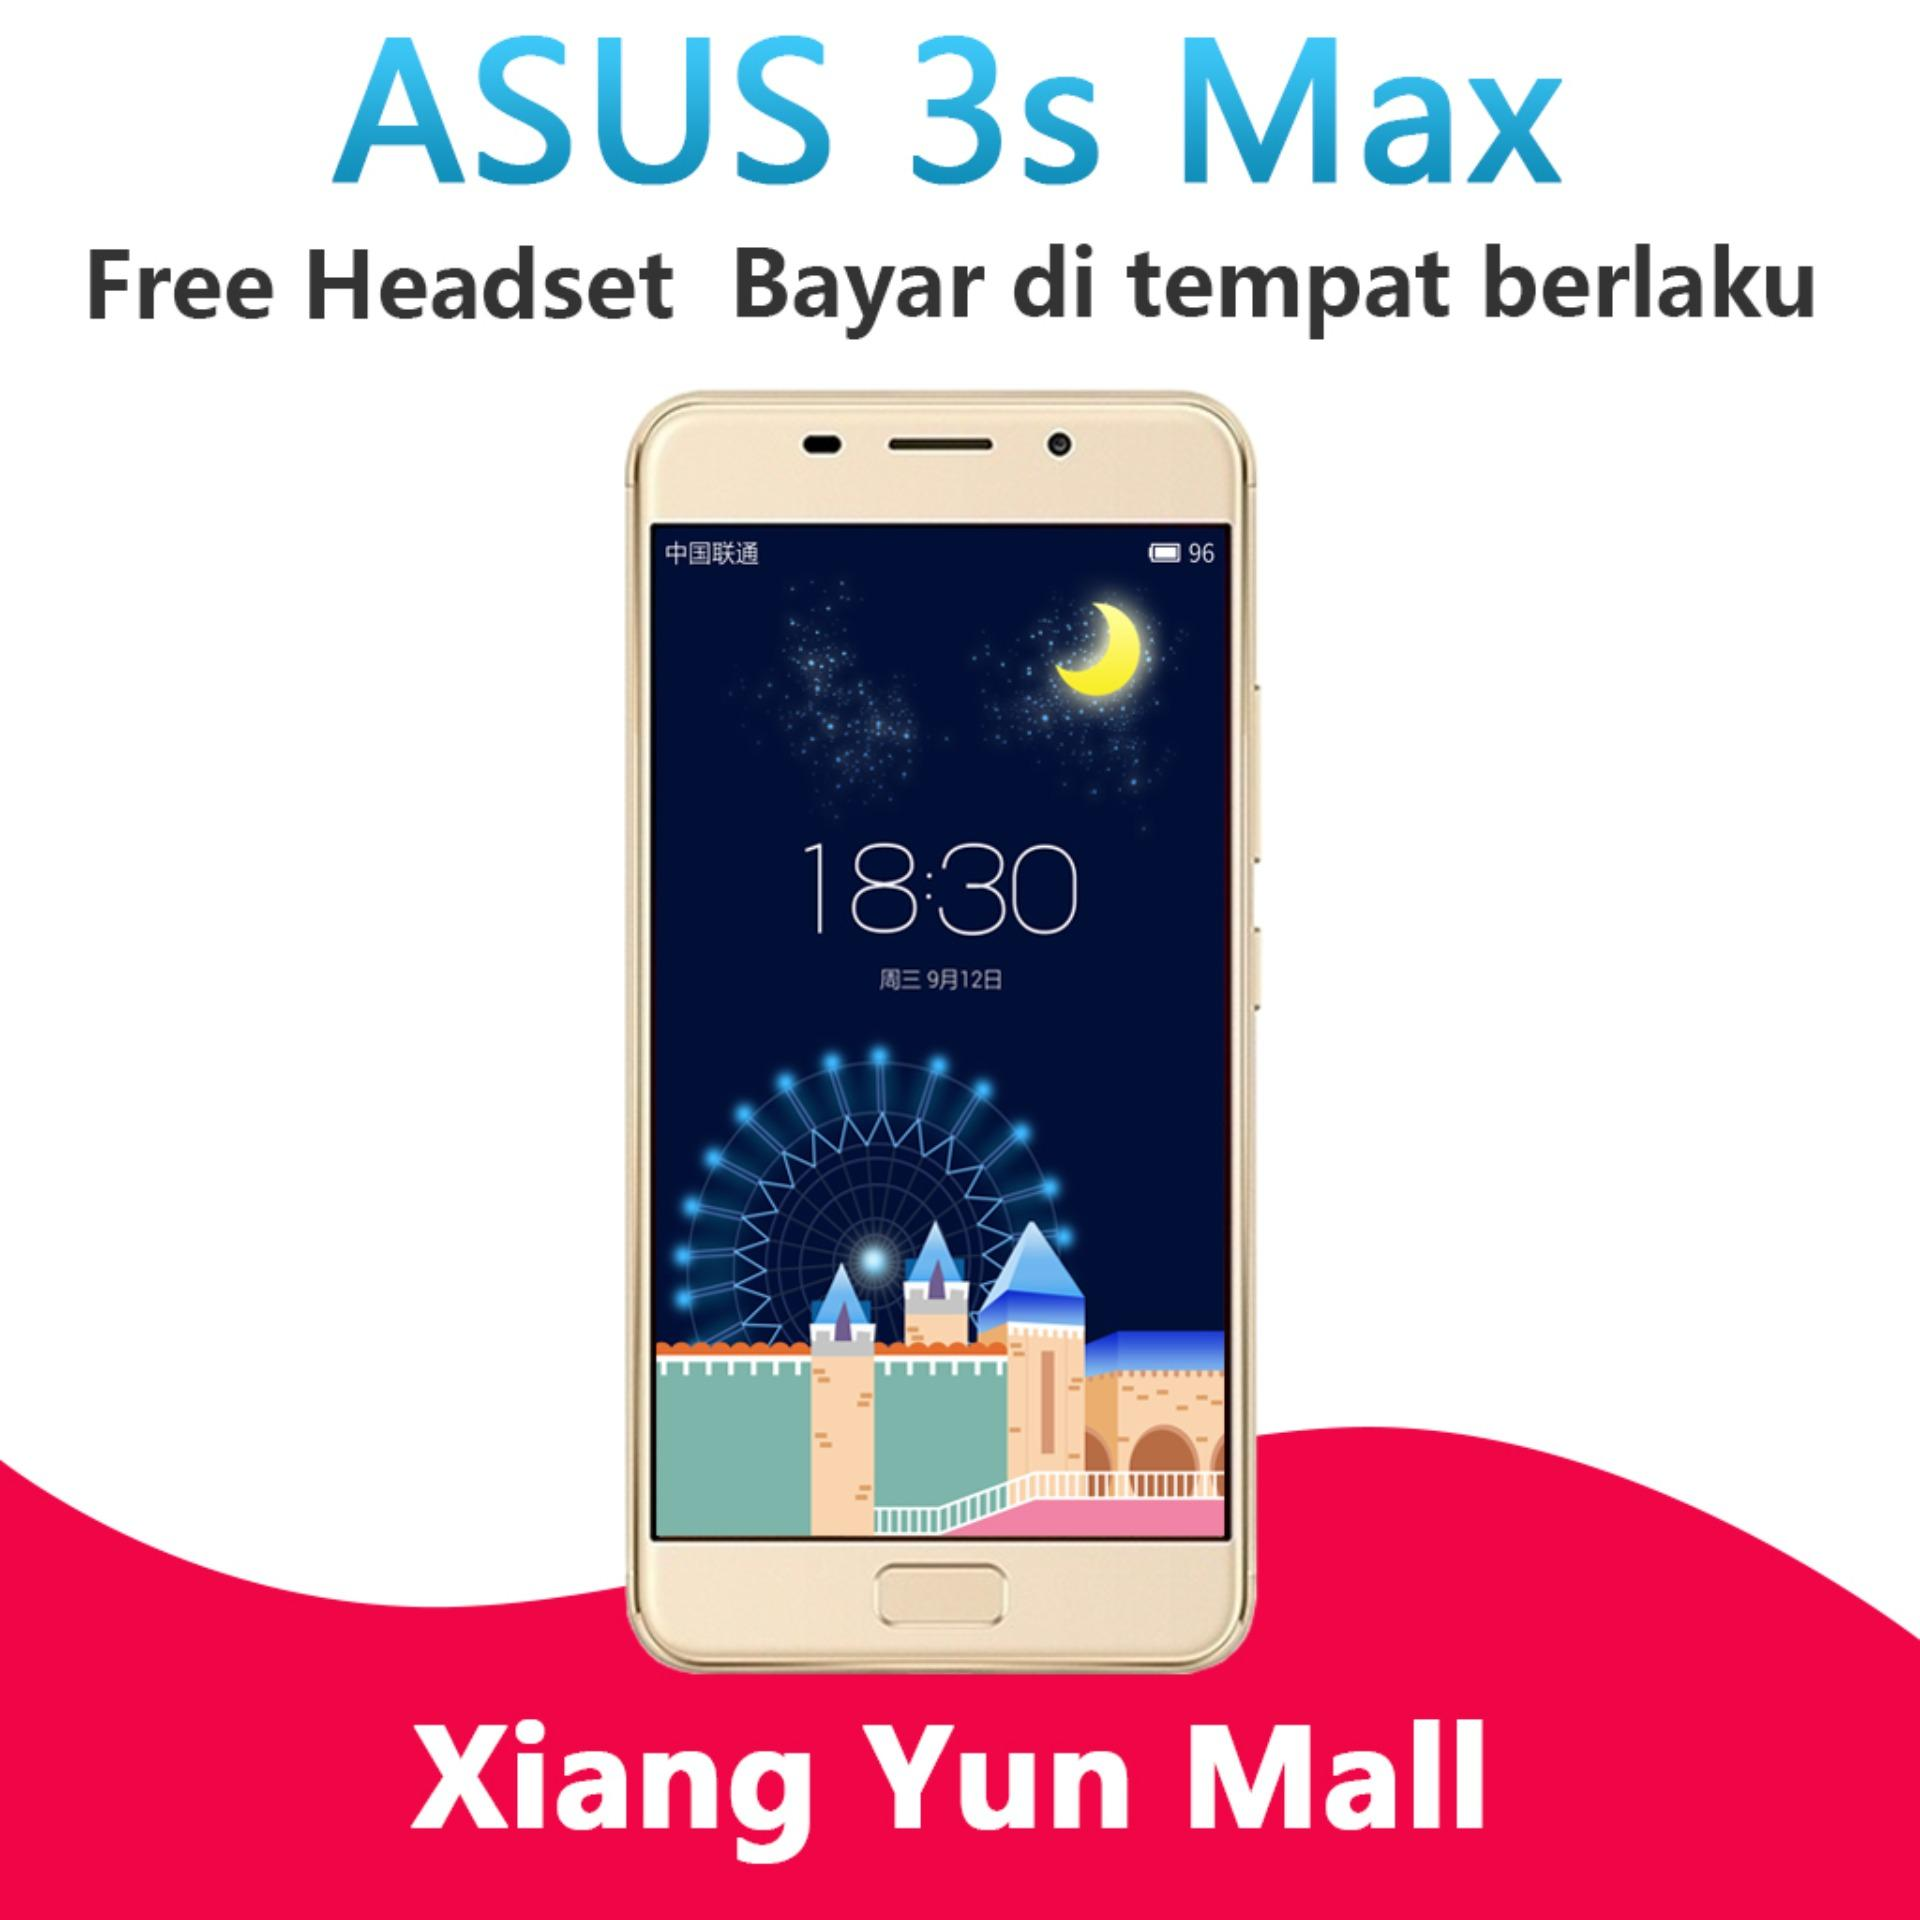 ASUS Zenfone 3s Max - 3GB/32GB ZC521TL 4GVolte 5000mAh